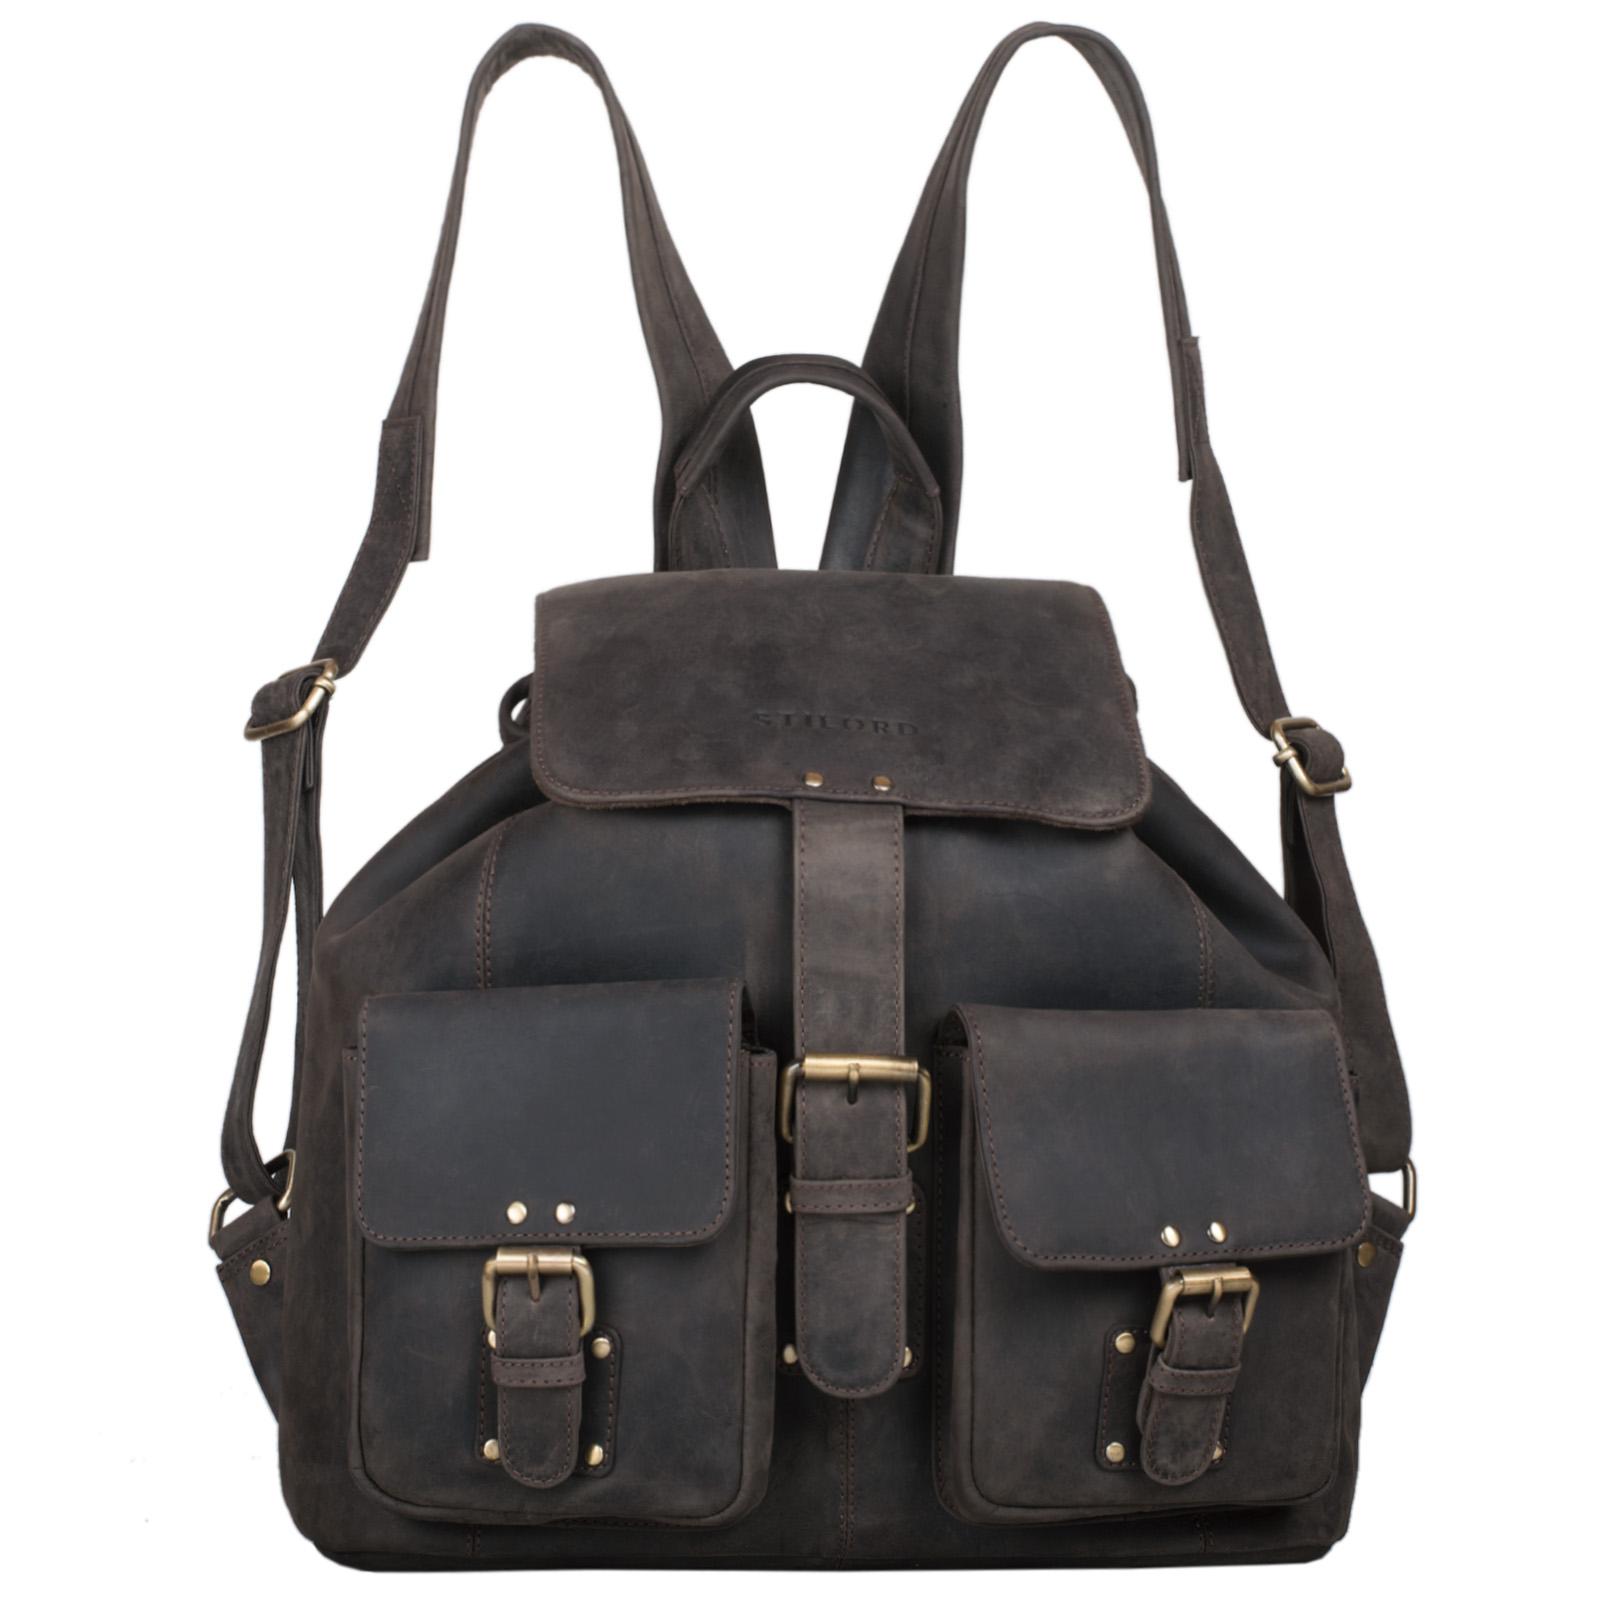 "STILORD ""Larissa"" Vintage Rucksack Leder Damen Rucksackhandtasche Lederrucksack Handtasche DIN A4 City Shopping Daypack Schule Uni - Bild 13"